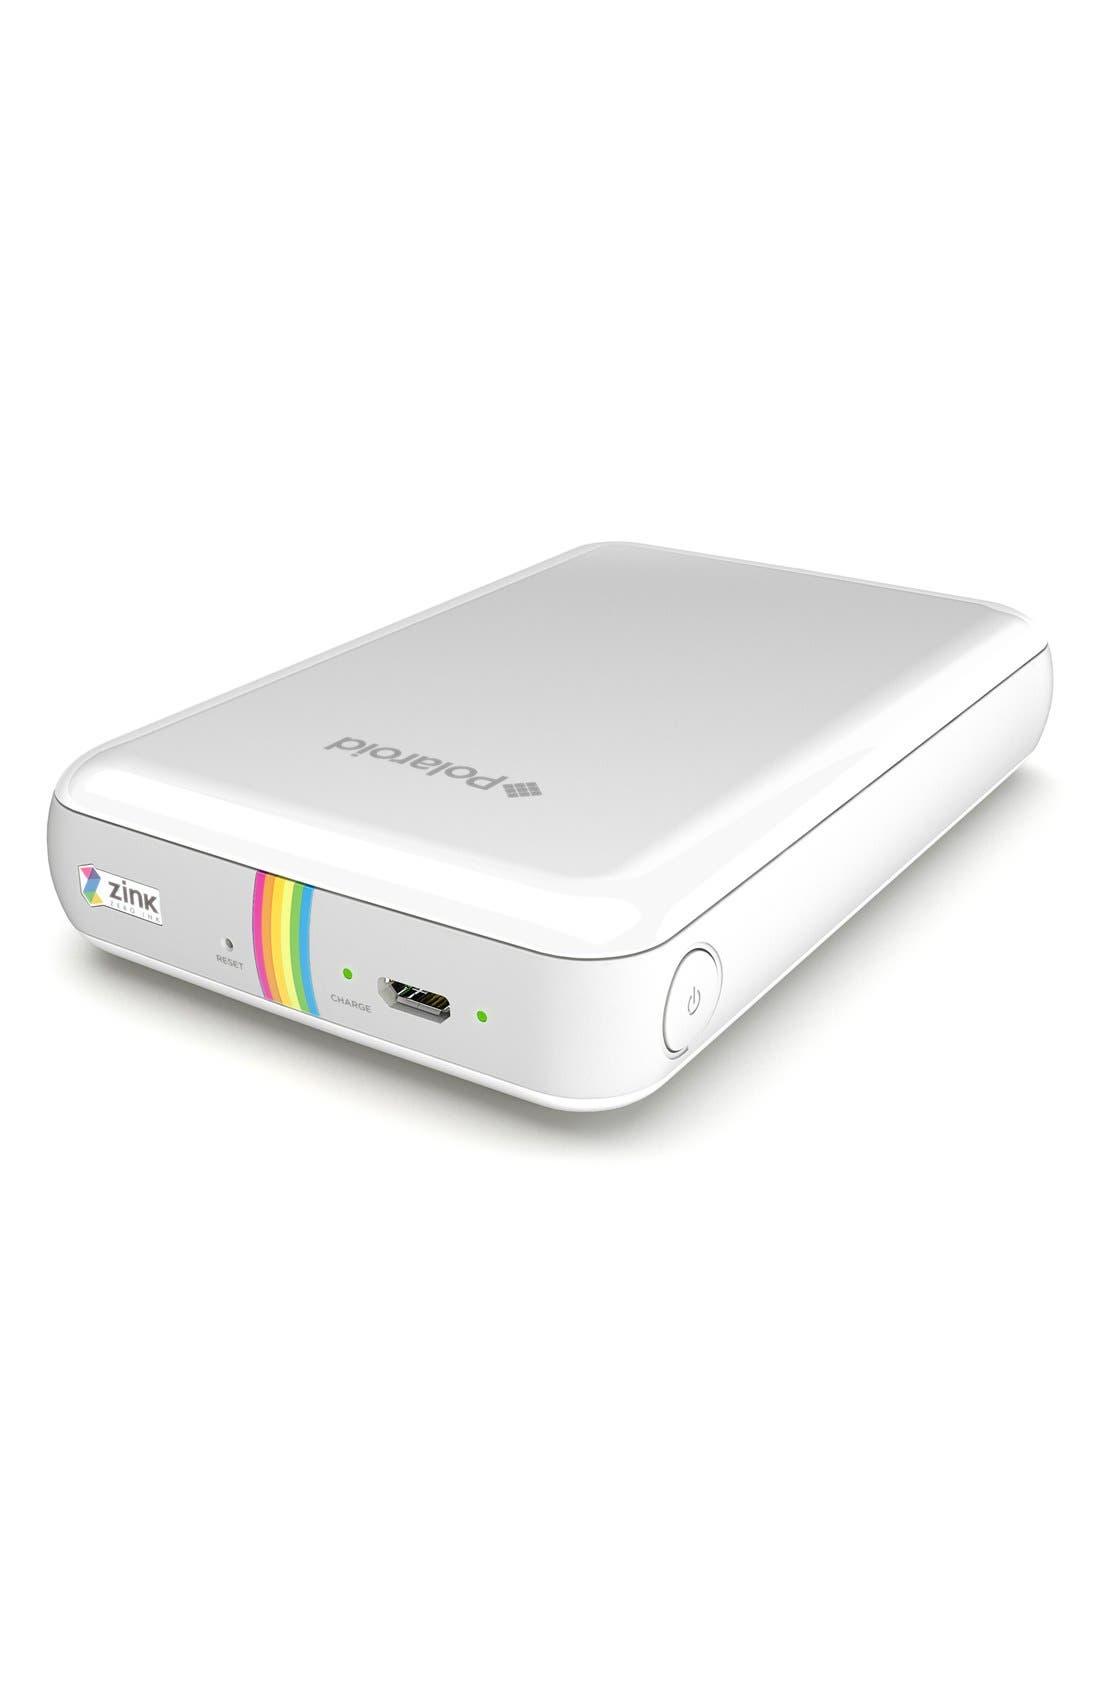 Alternate Image 2  - Polaroid 'Zip' Mobile Instant Photo Printer